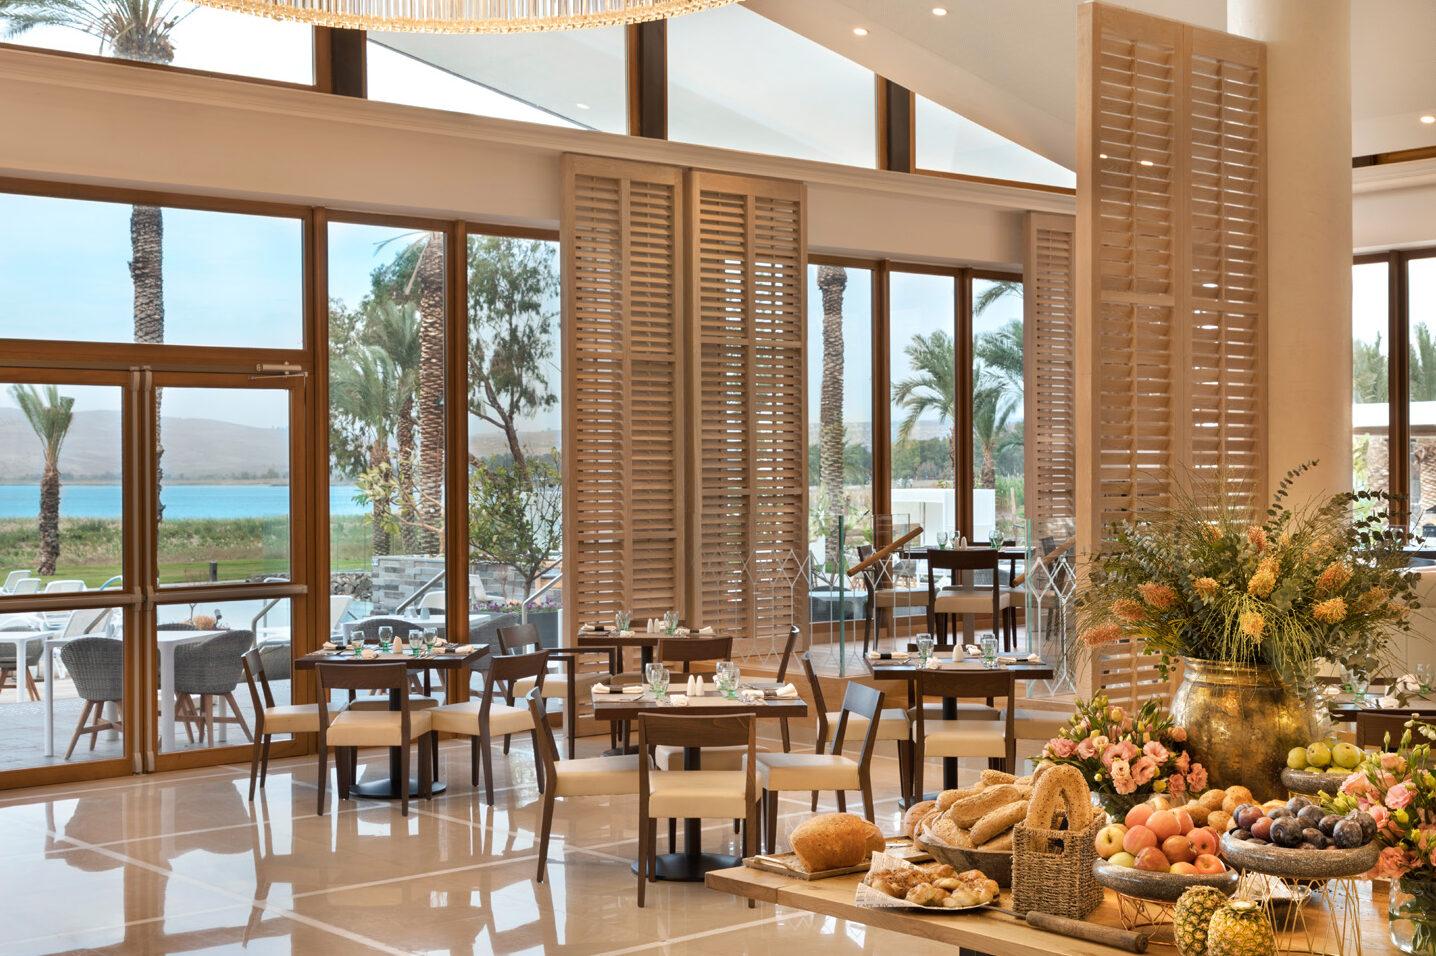 THE SETAI HOTEL SEA OF GALILEE